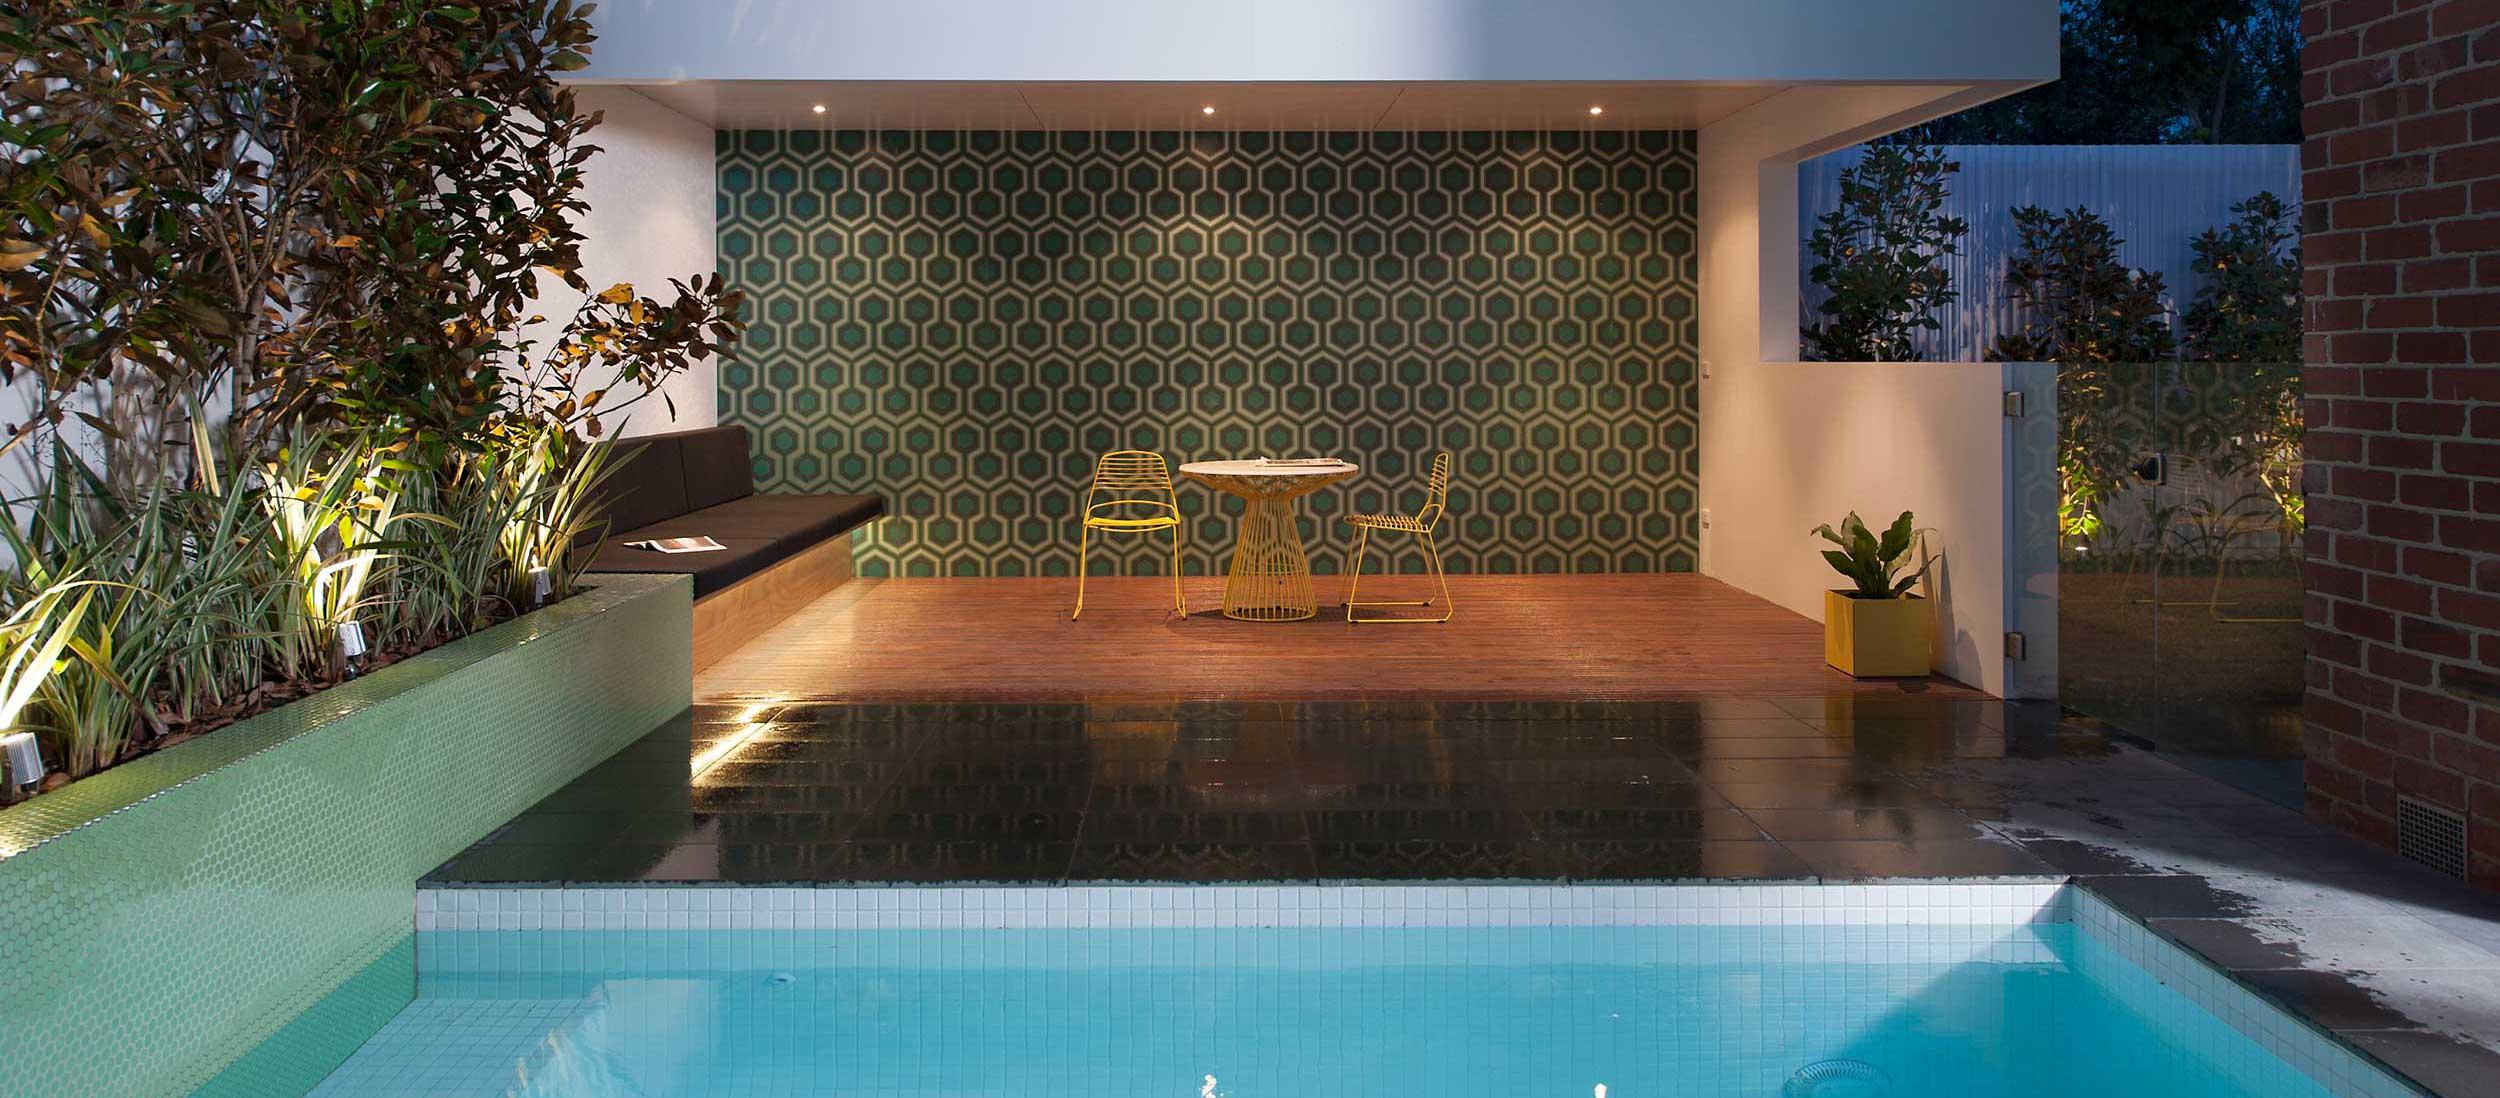 pool-design-brighton-Birghton-02_03